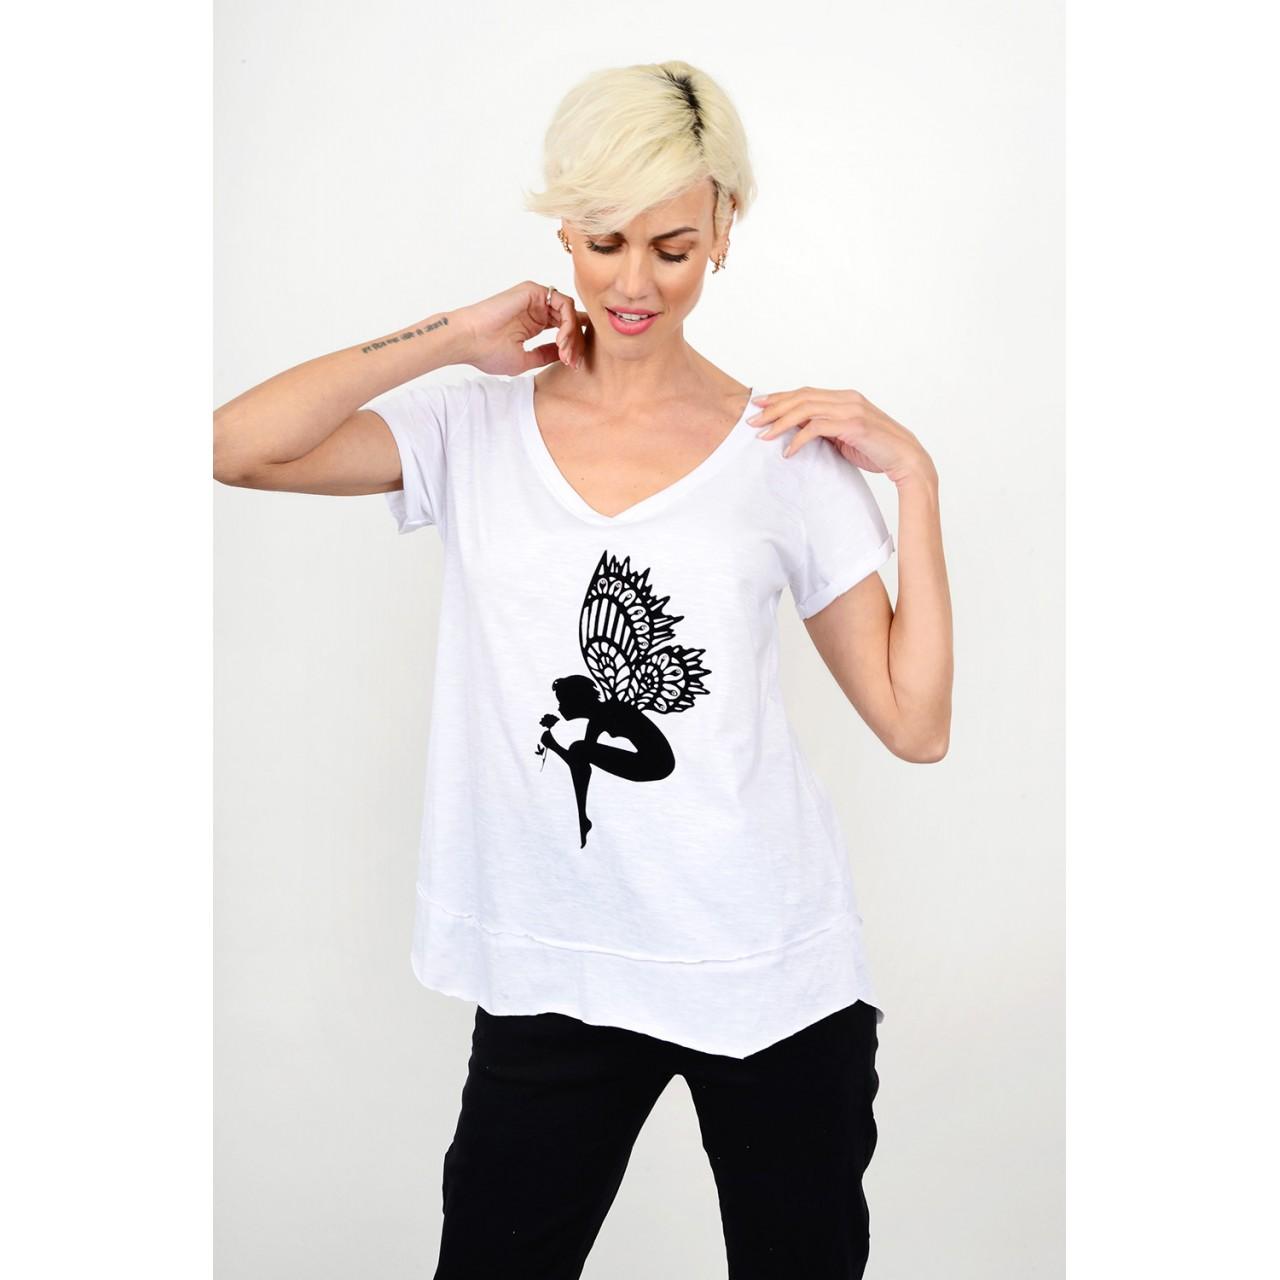 190.Oversized μπλούζα χειροποίητη με τύπωμα